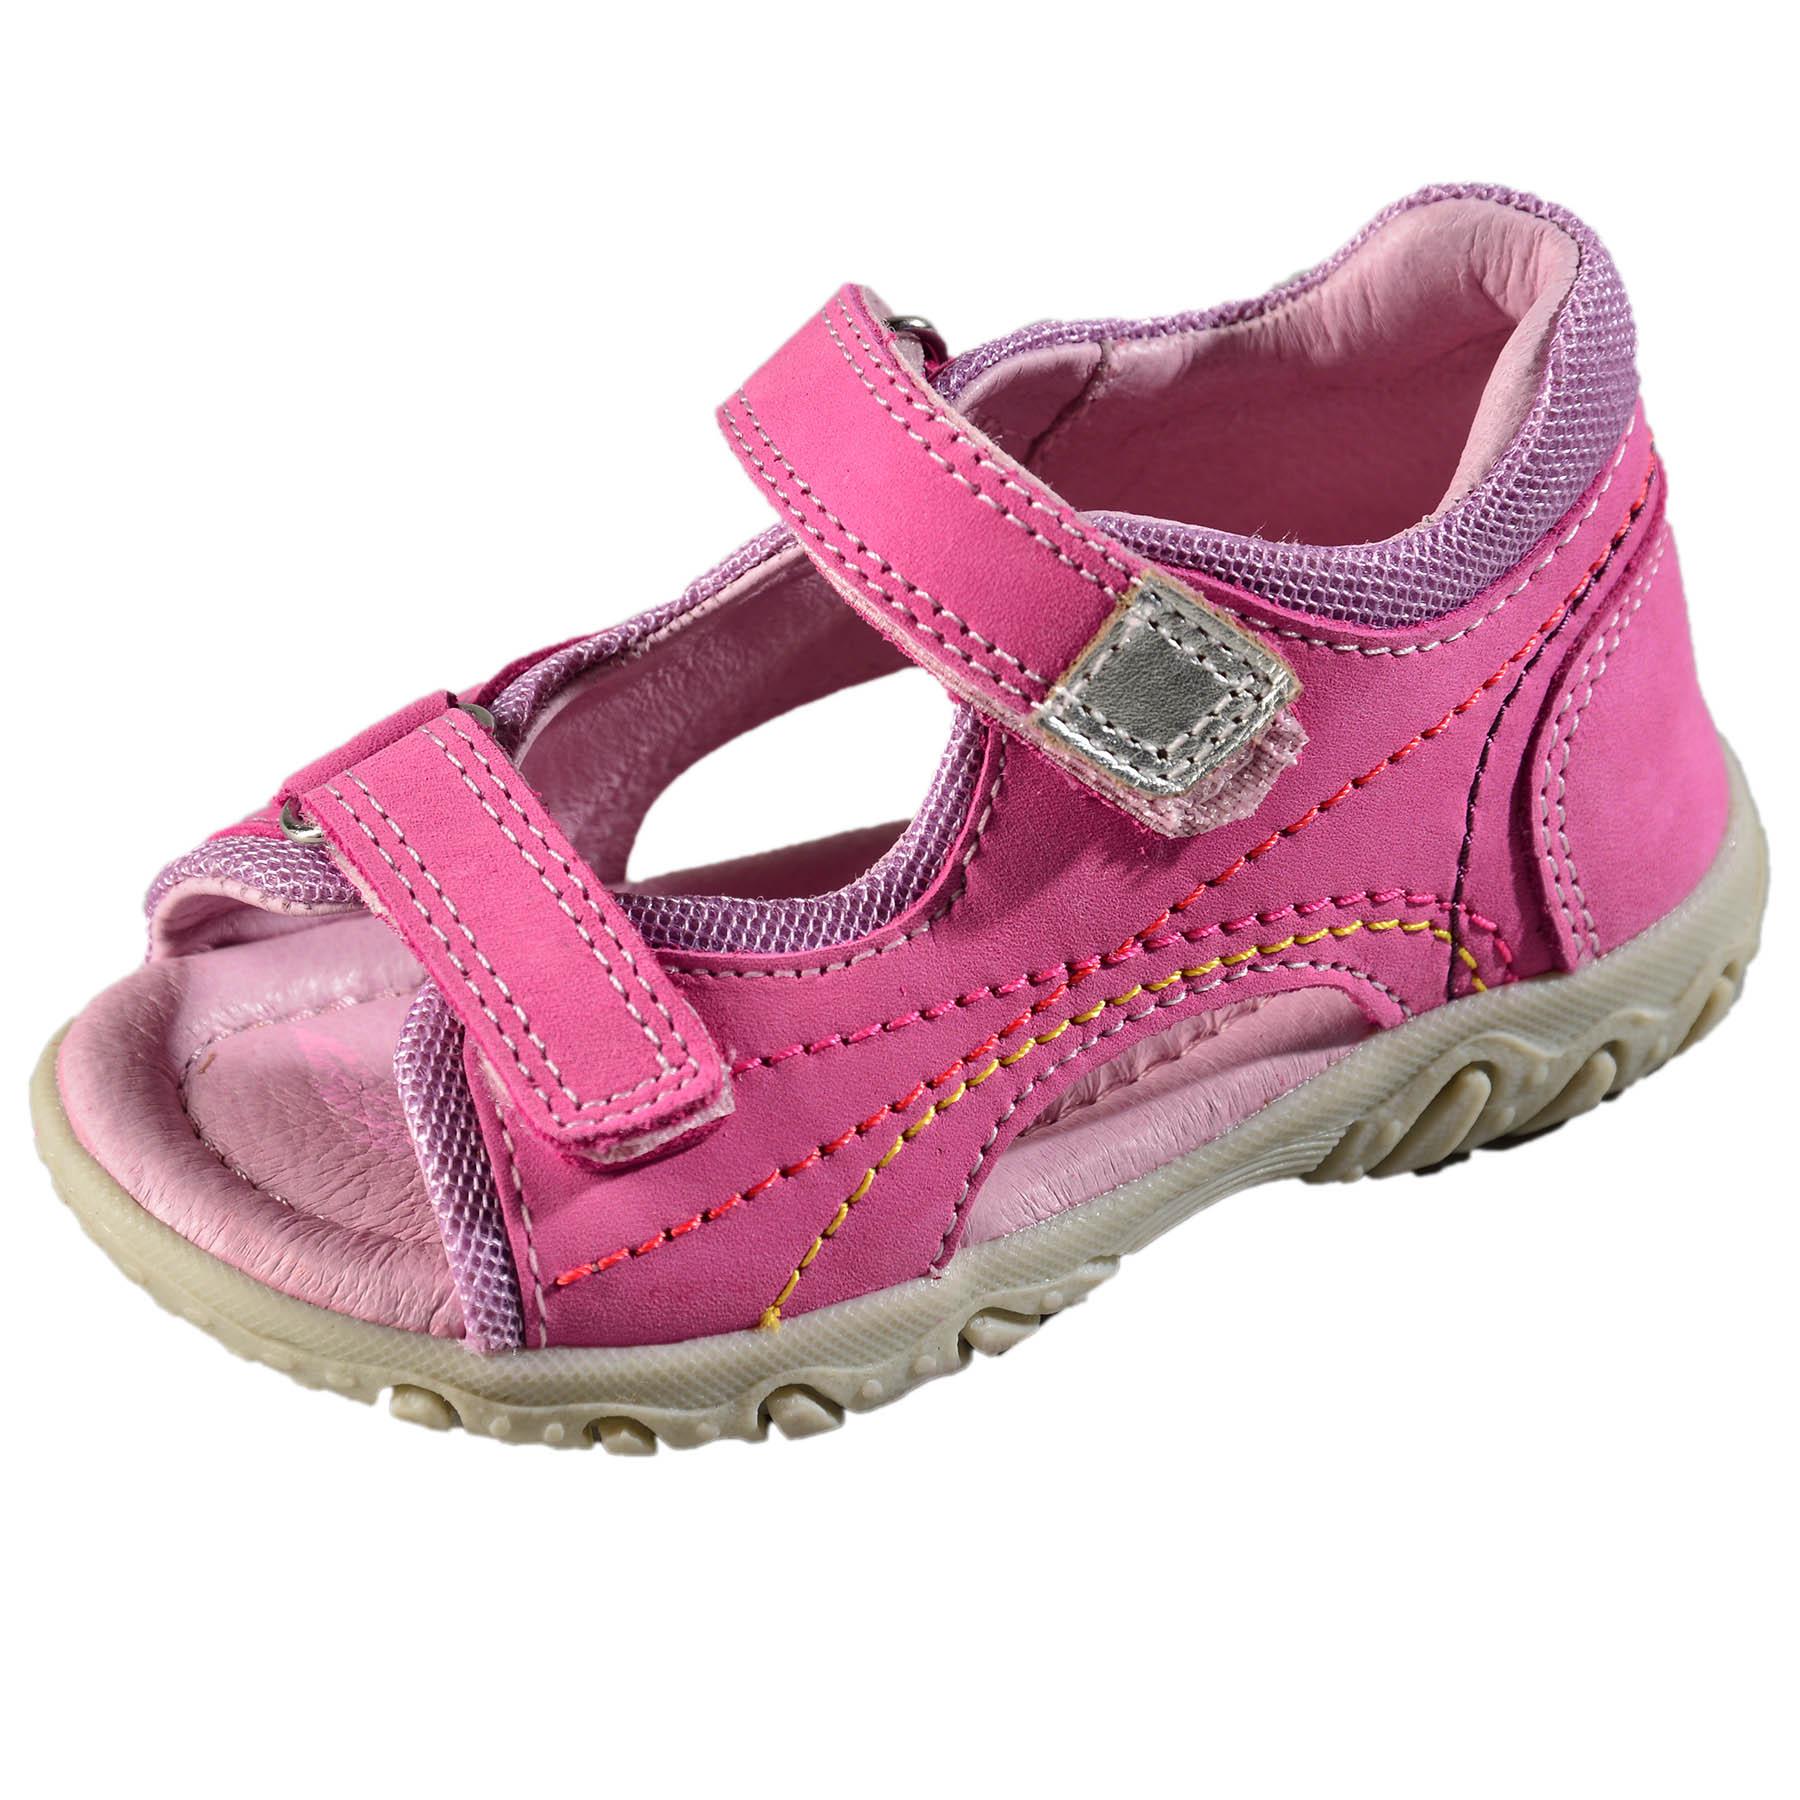 2e398182c2e9 Dievčenské sandálky DDstep - AC625-28